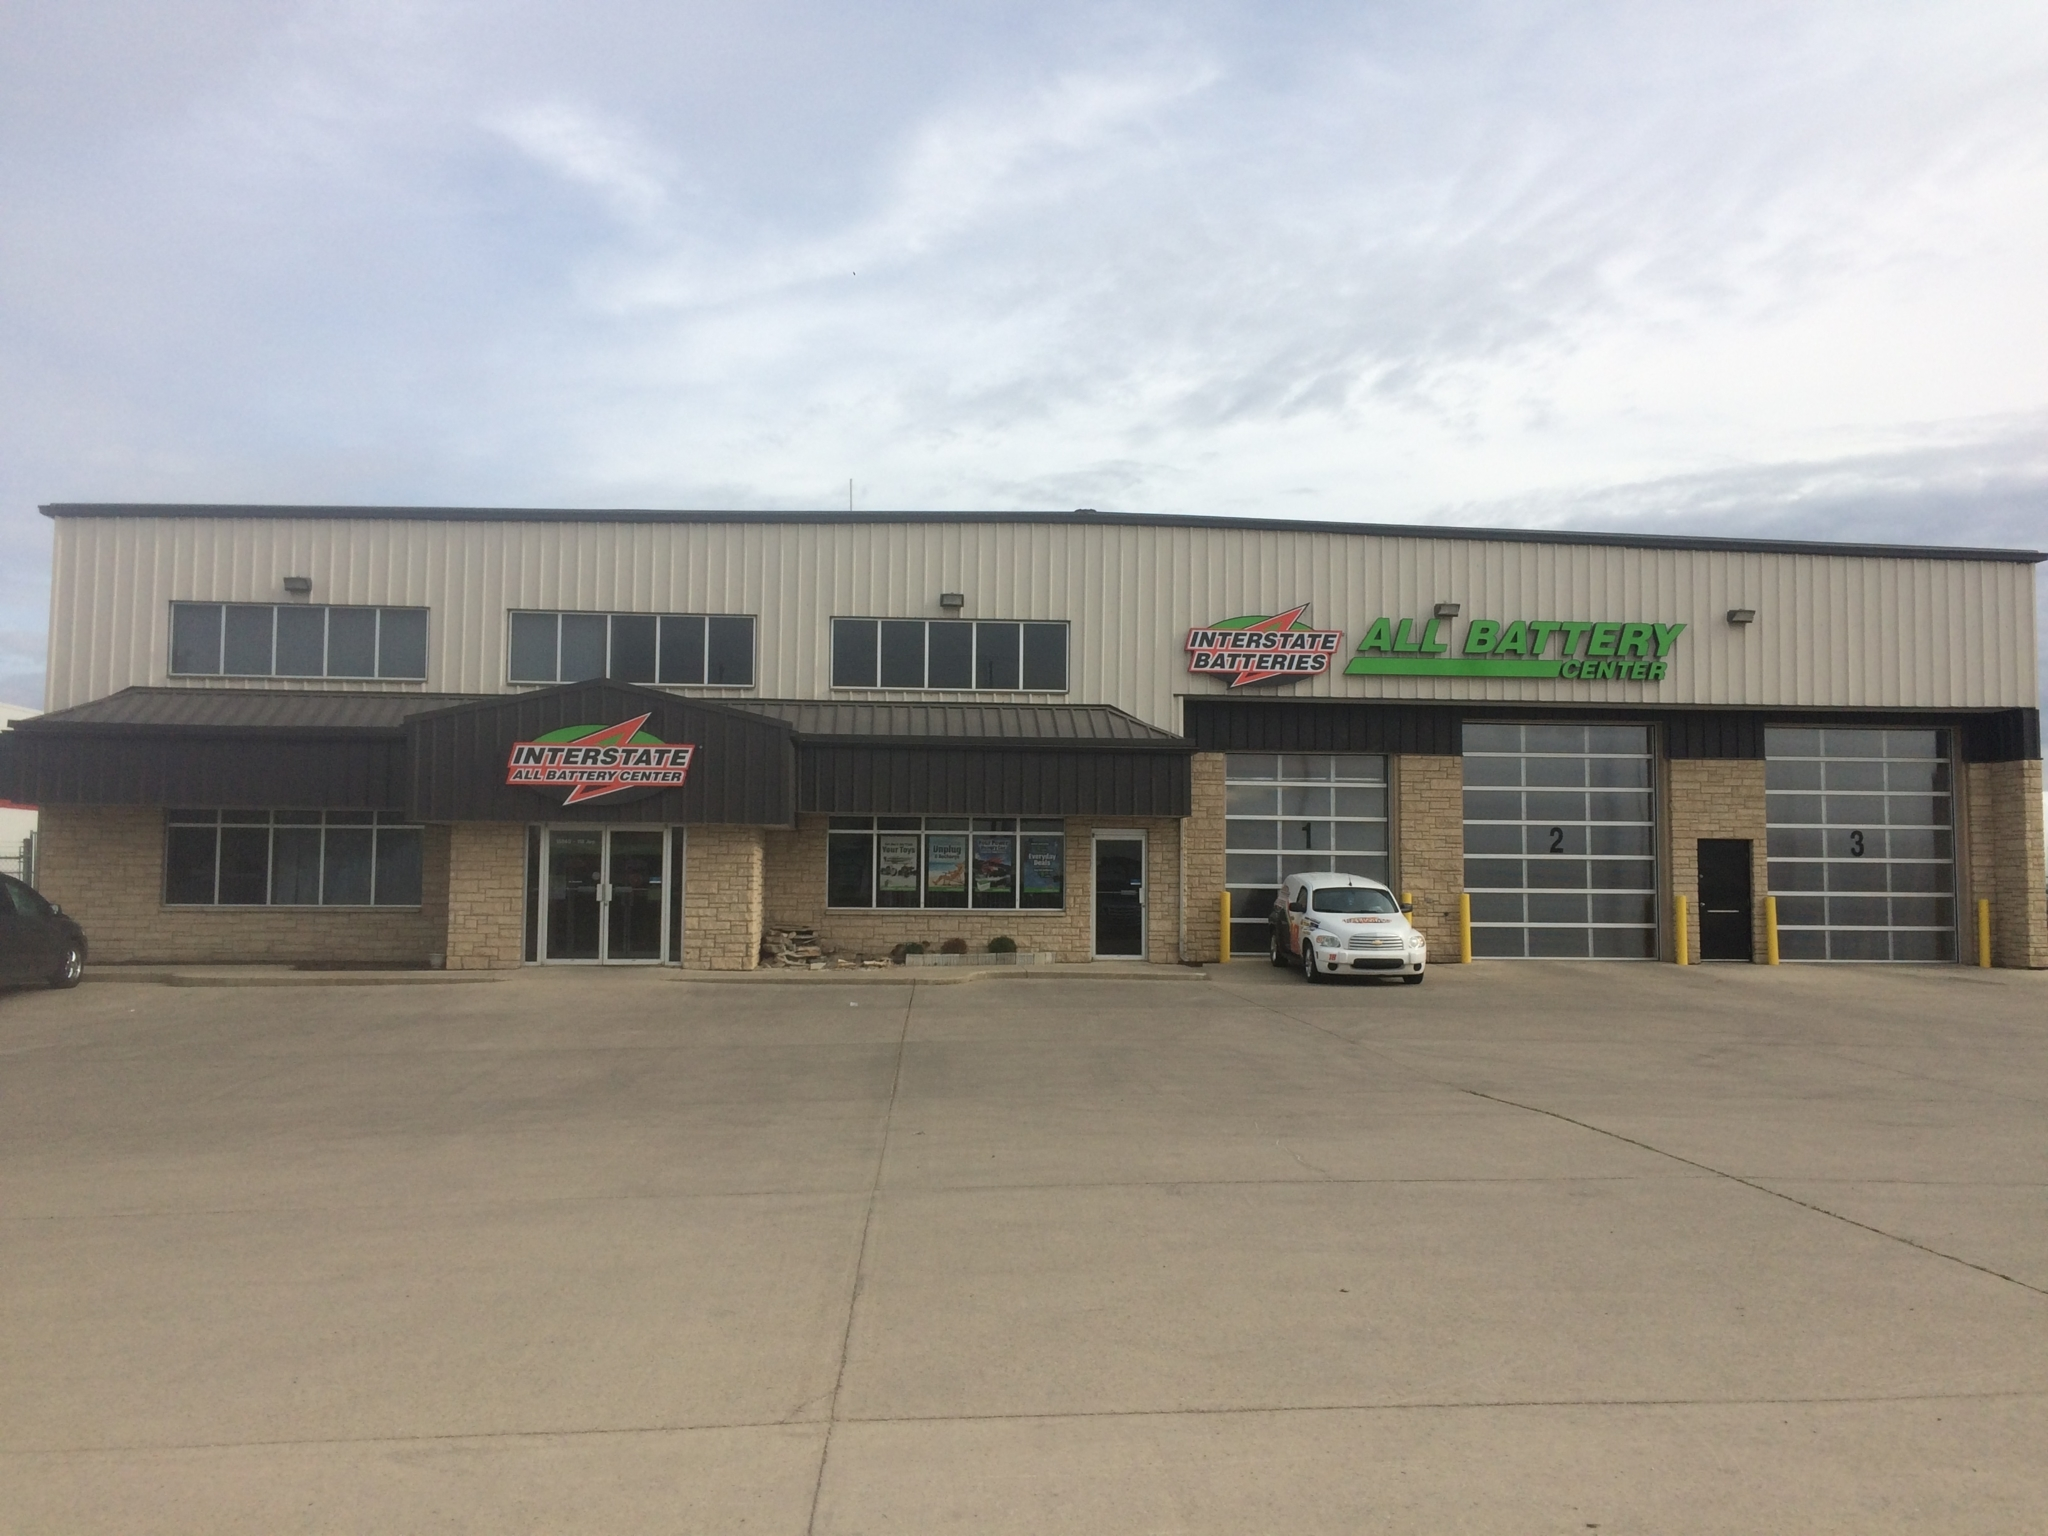 Interstate Batteries Store Front Interstate Batteries Edmonton (780)454-4343